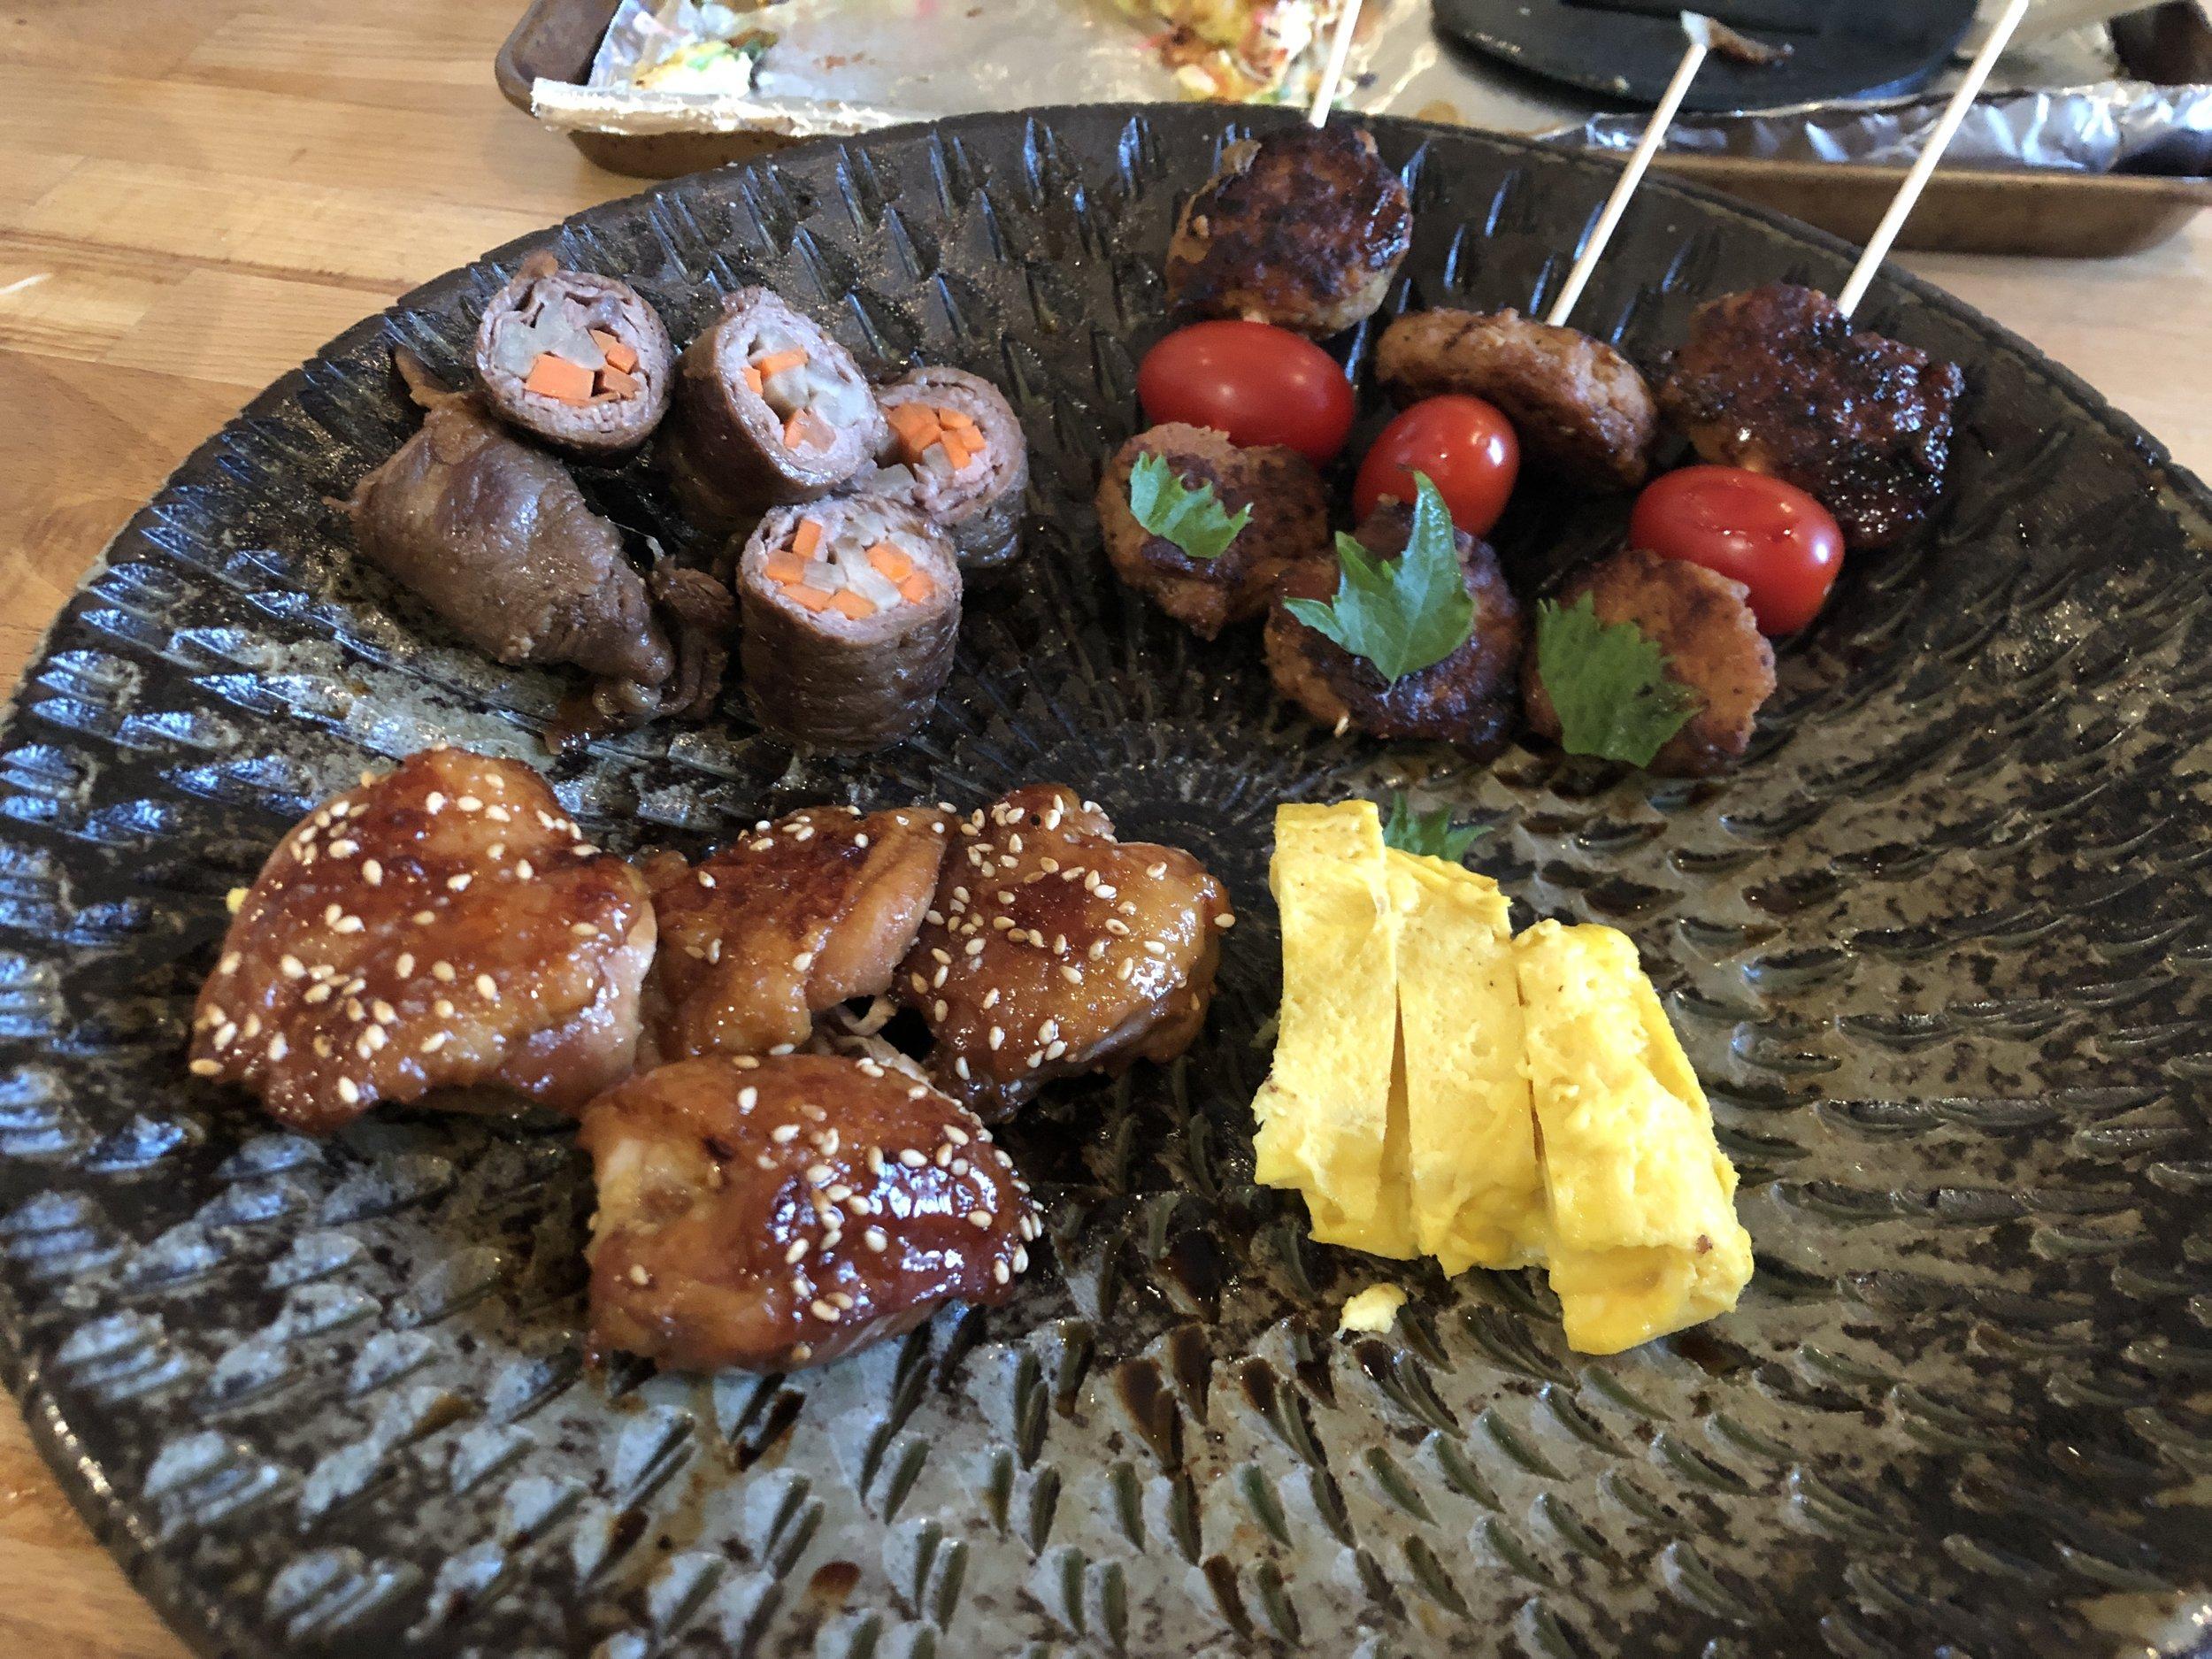 Izakaya: Japanese bar foods - Peppery teriyaki chicken, savory Osaka style Okonomiyaki pancake to everyday comfort foods to end the night. Not just for beer and sake lovers.Book Online